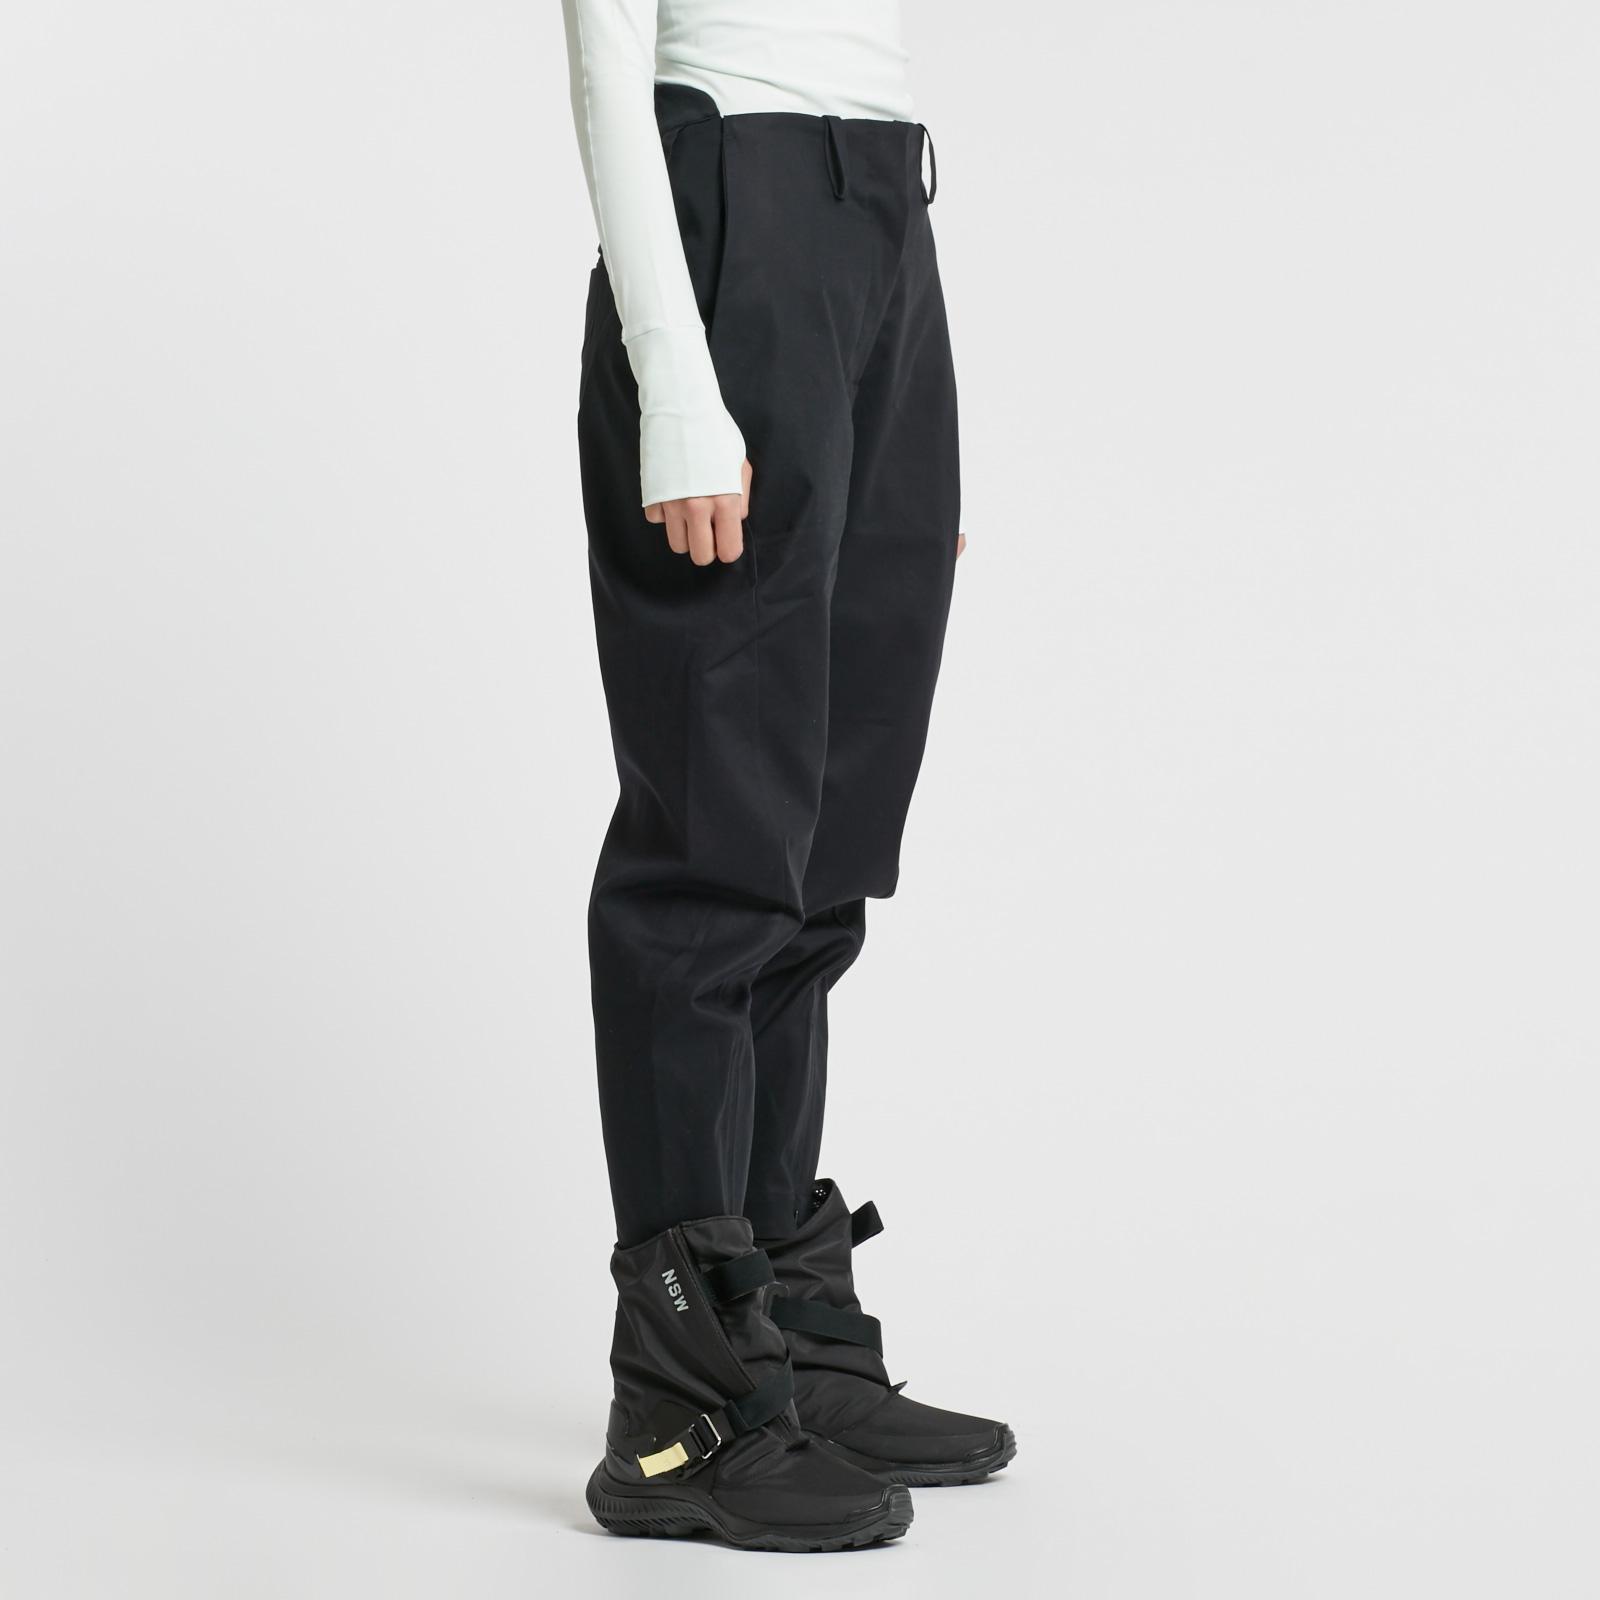 c7d9d023e15d Nike W ACG Tech Woven Pant - 914471-010 - Sneakersnstuff